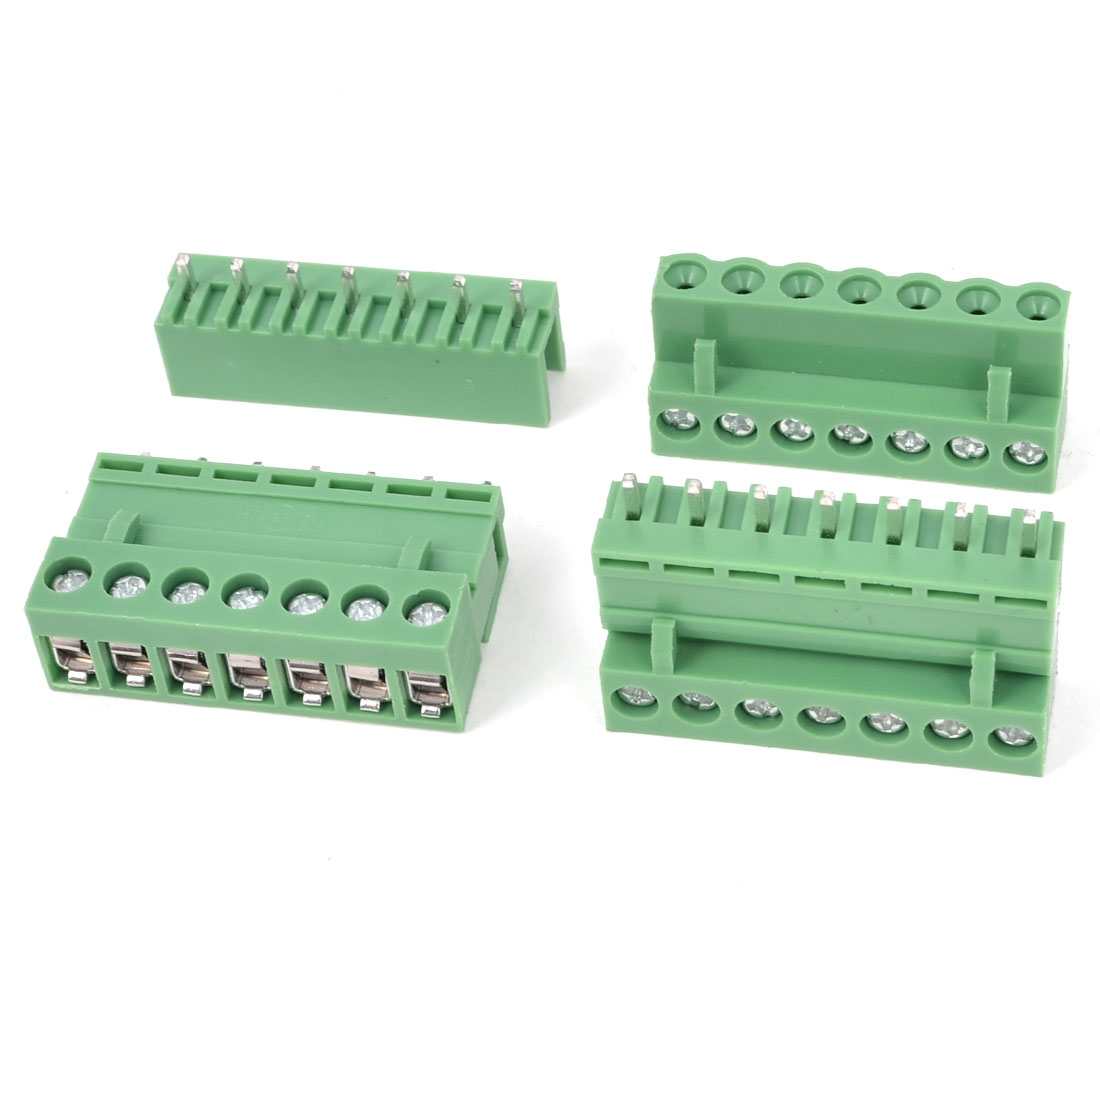 3 Pcs AC 300V 10A 7P Pins PCB Screw Terminal Block Connector 5.08mm Pitch Green